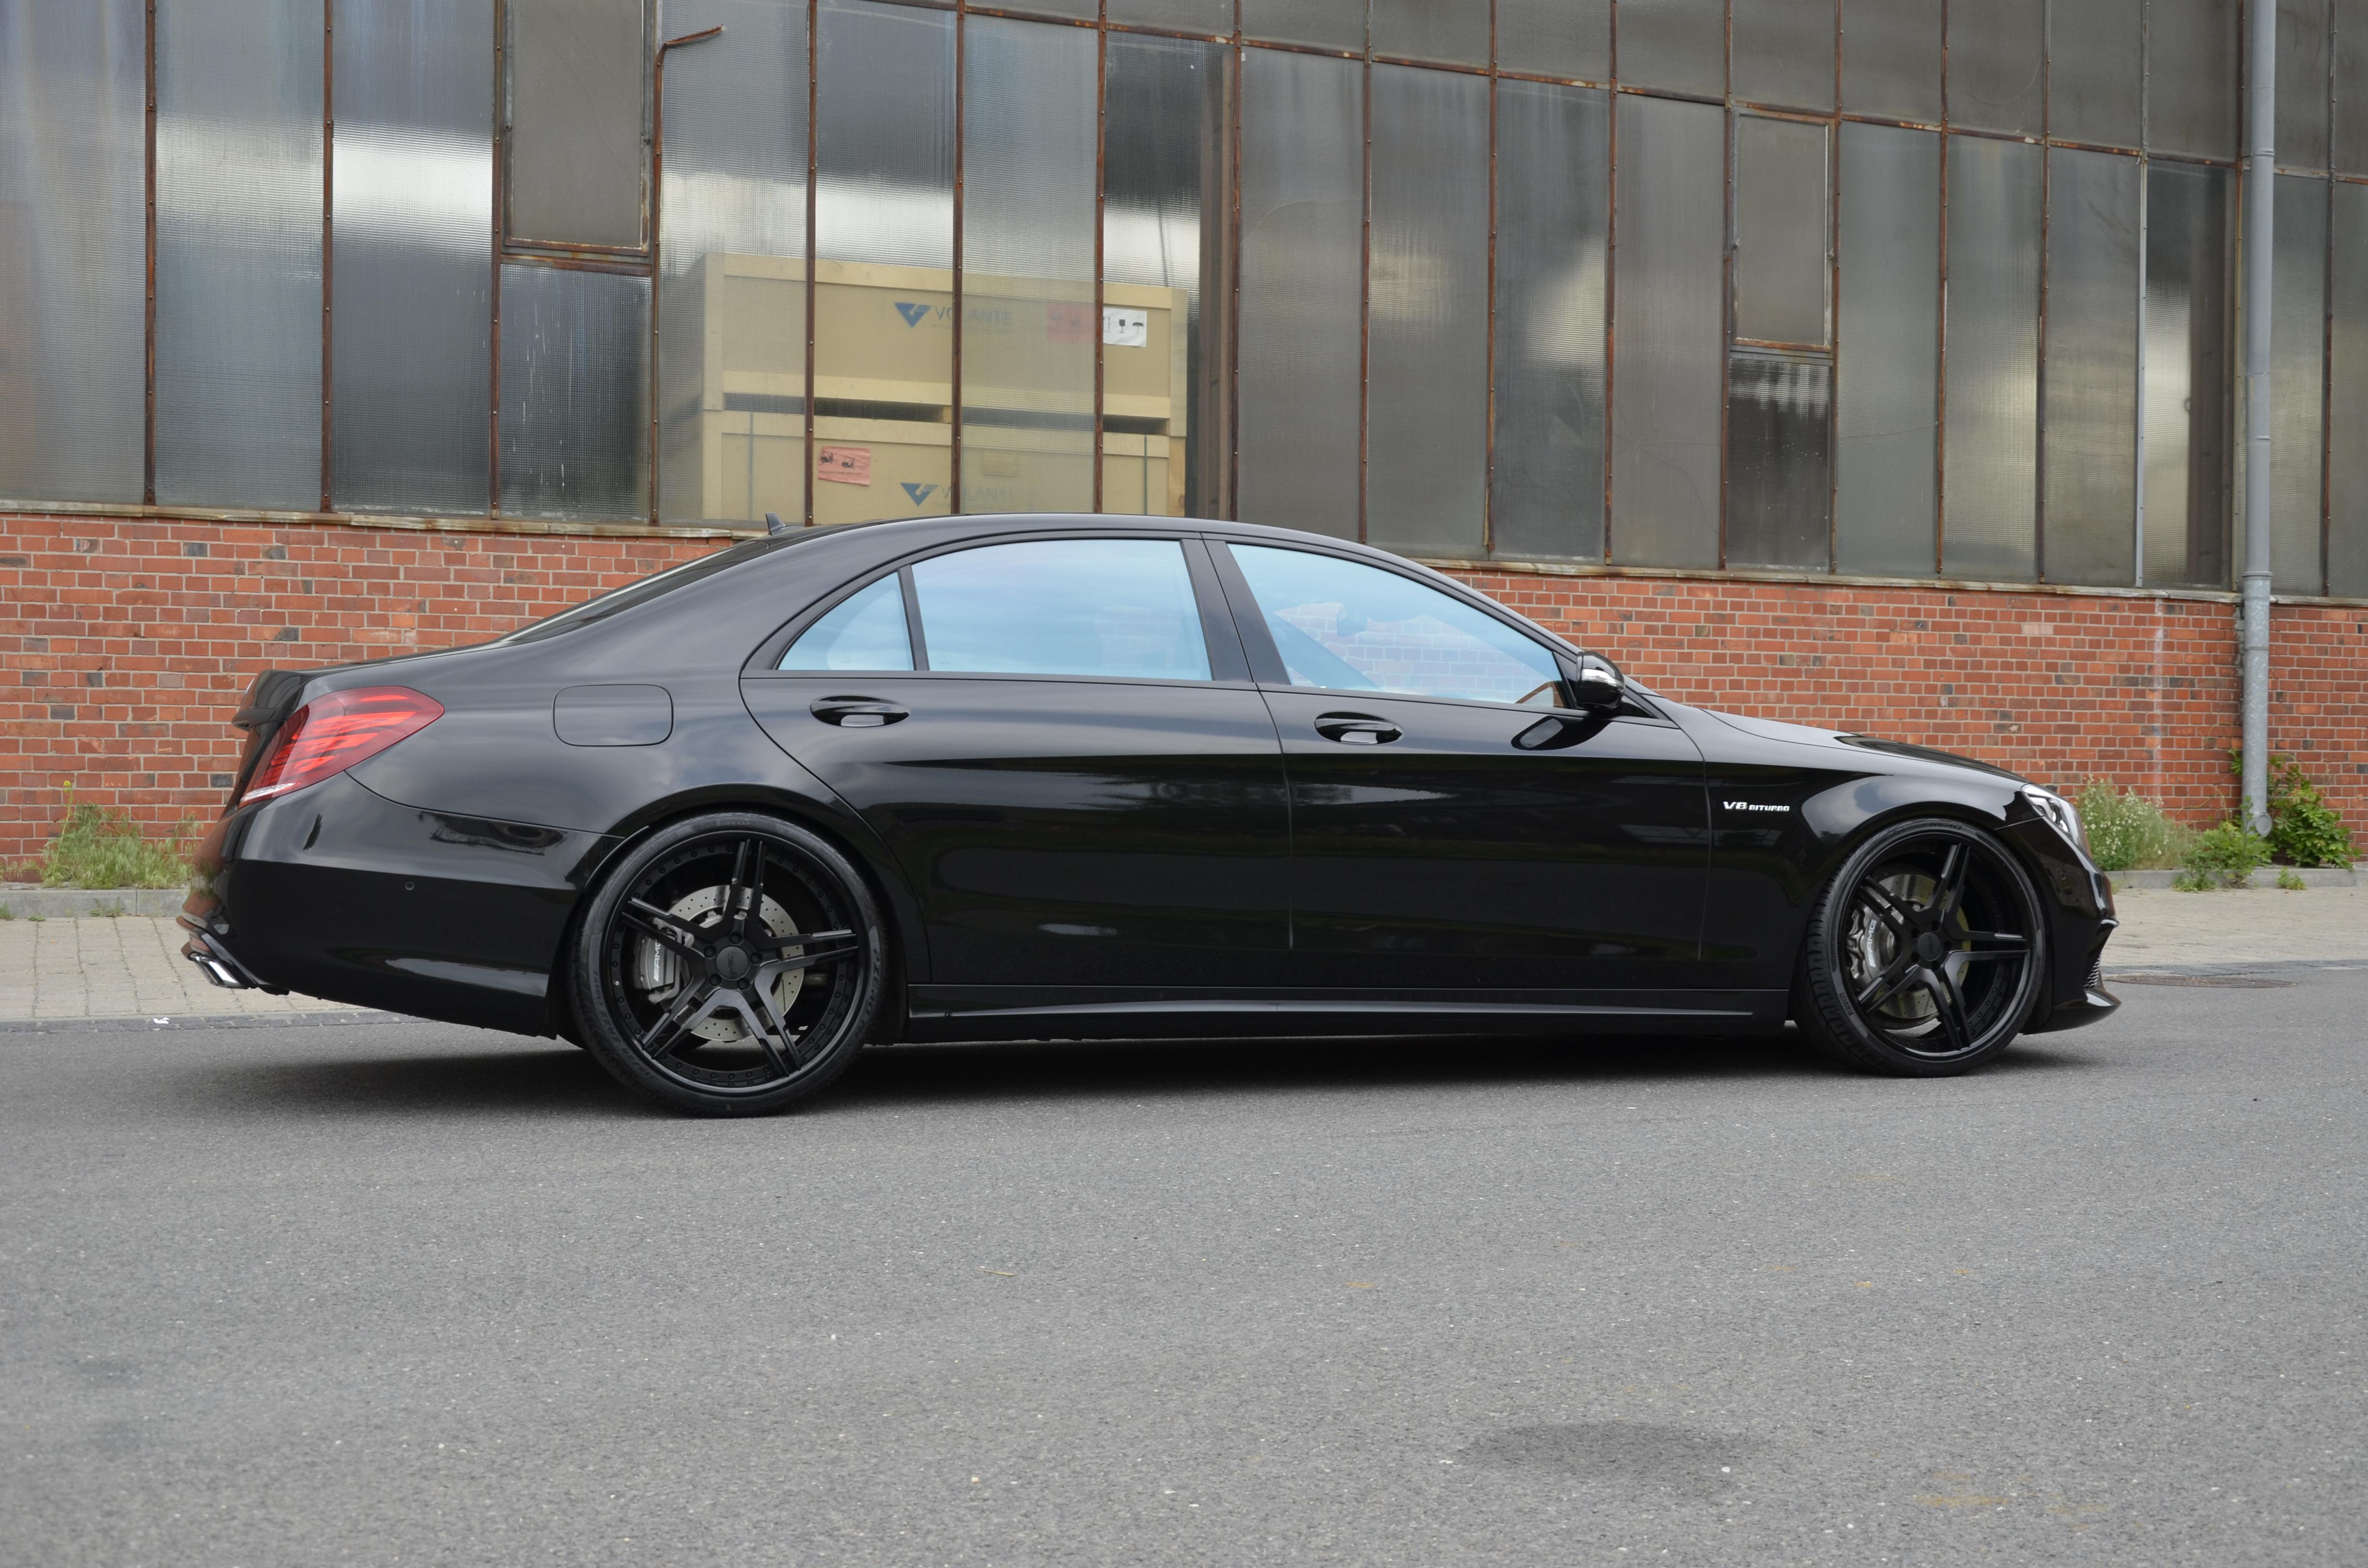 MEC Releases Customized Mercedes S63 AMG - BenzInsider.com ...